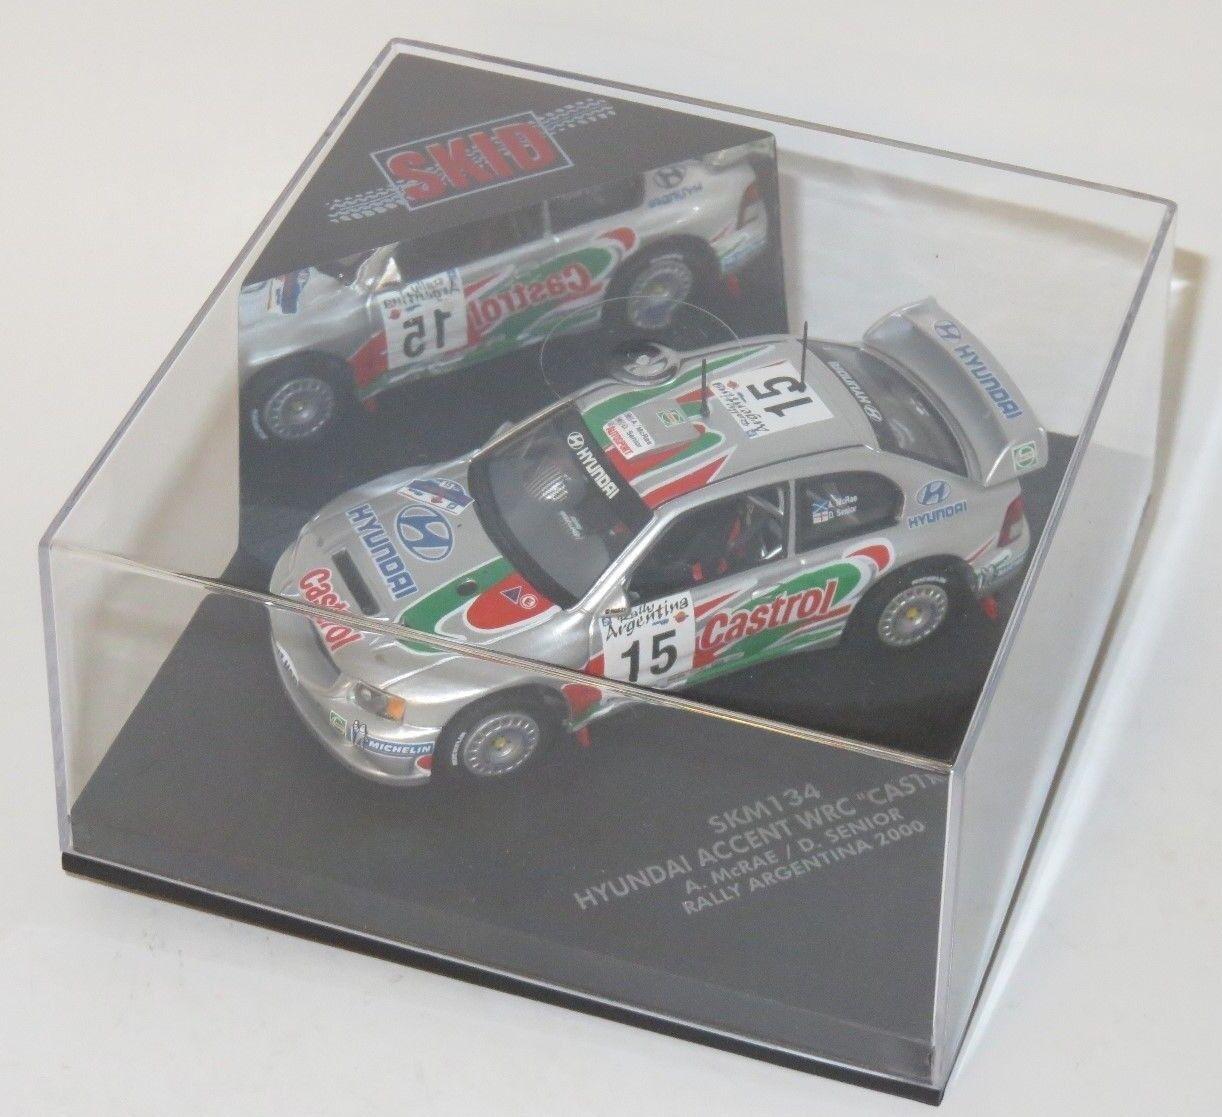 1 43 HYUNDAI ACCENT WRC CASTROL ITALIANA di Rtuttiy argentoina 2000 A. McRae D. Senior